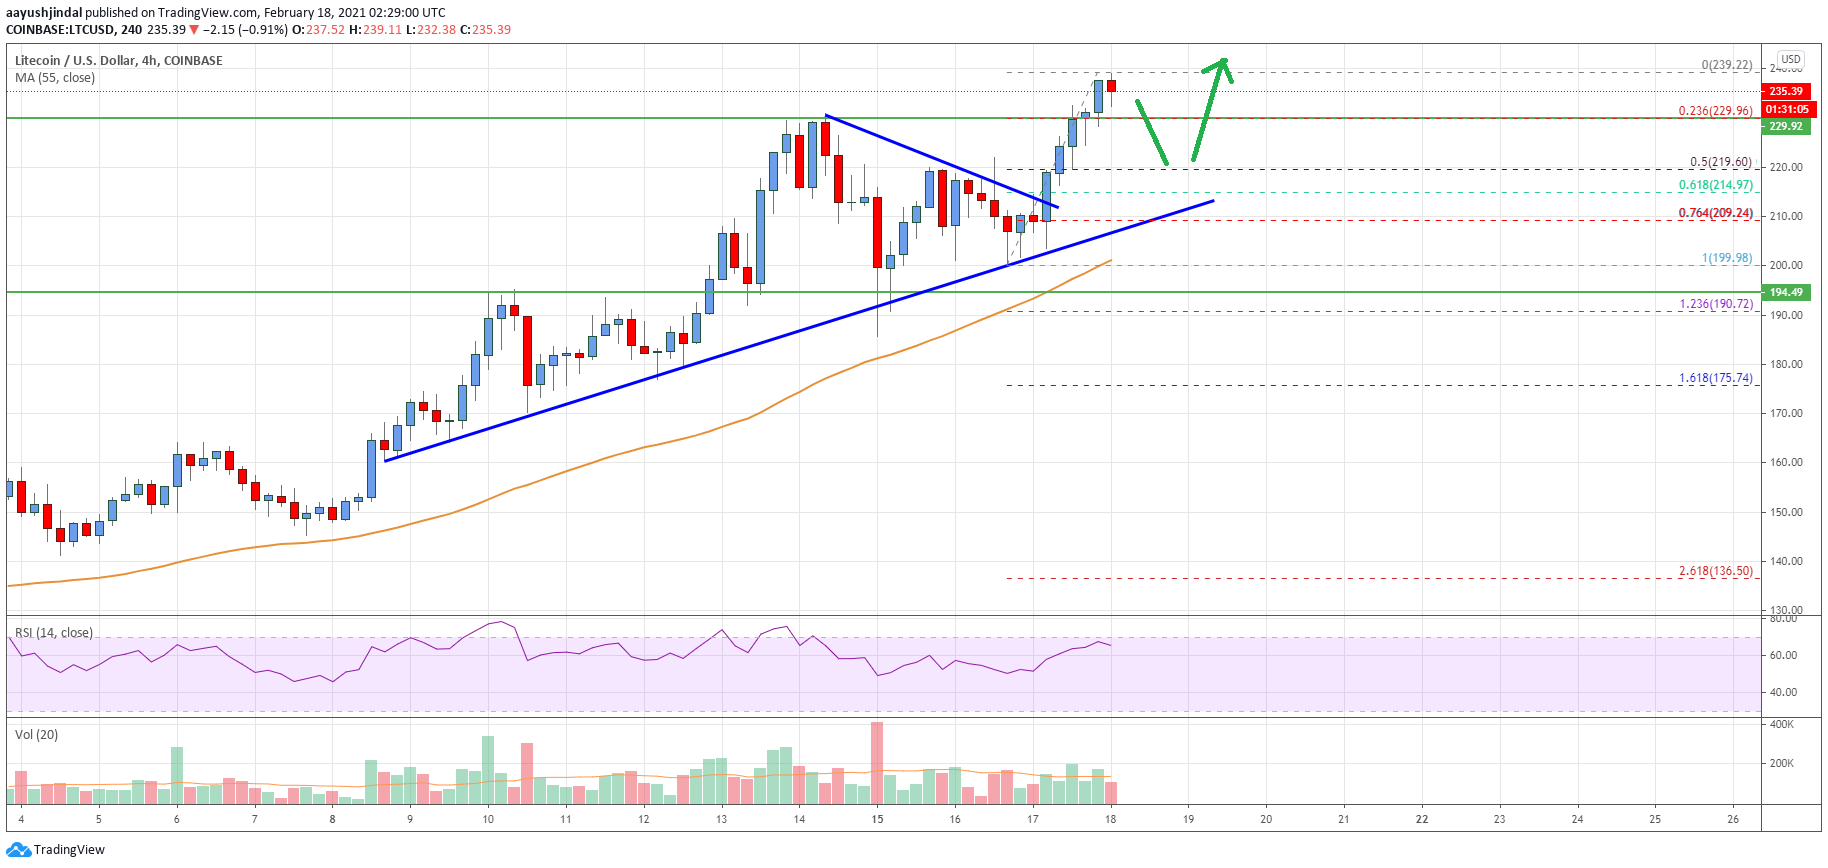 Litecoin (LTC) Price Analysis: Bulls Aim A Break Above $250